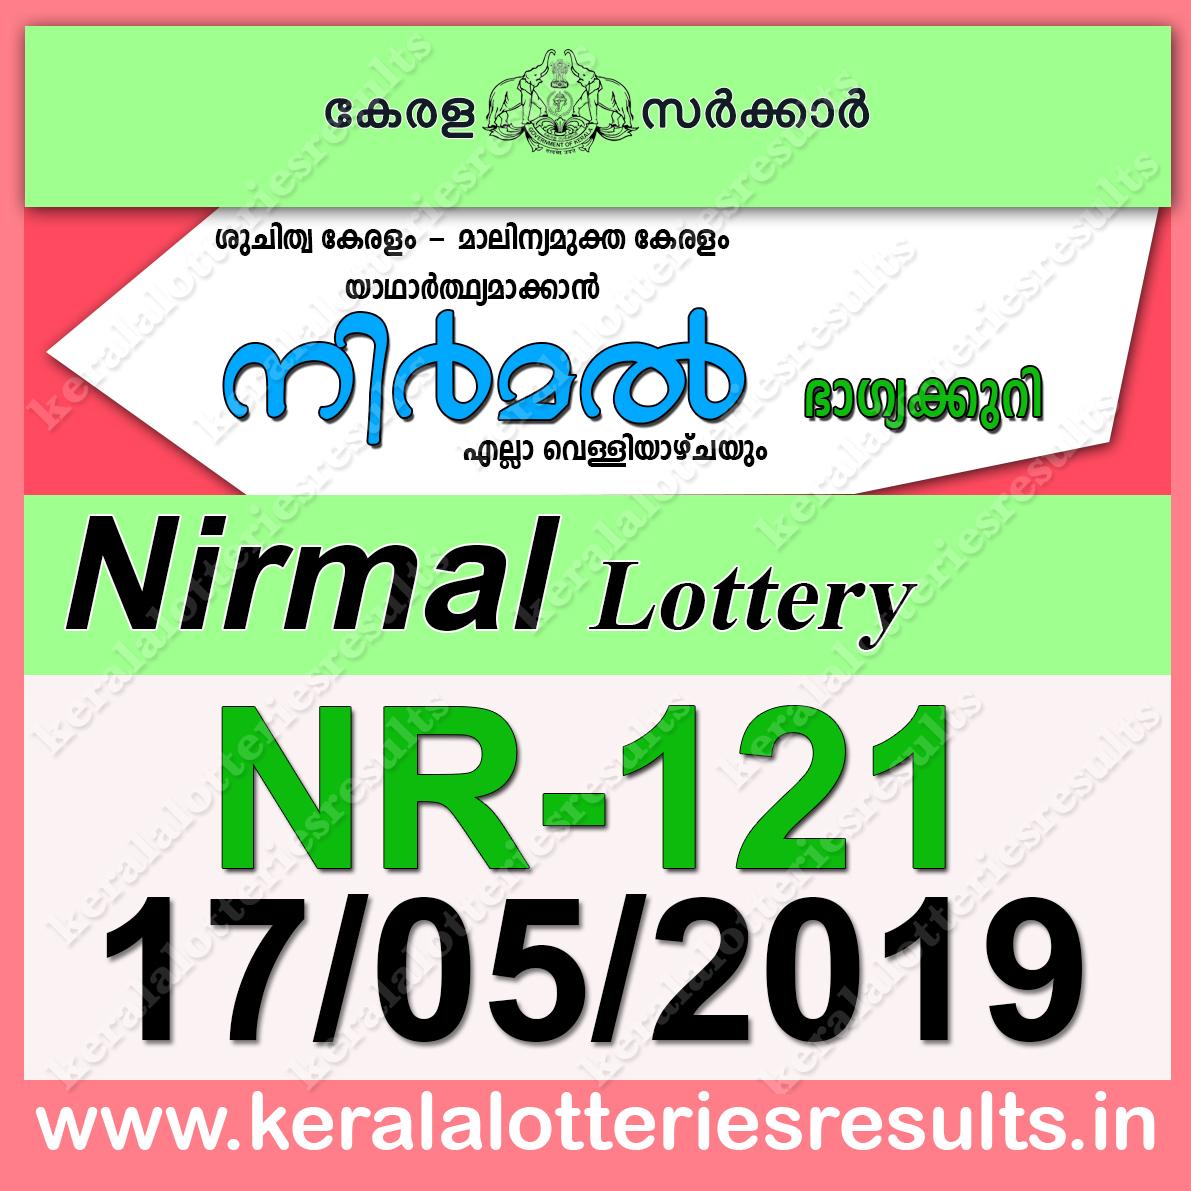 05 >> Kerala Lottery Results 17 05 2019 Nirmal Lottery Result Nr 121